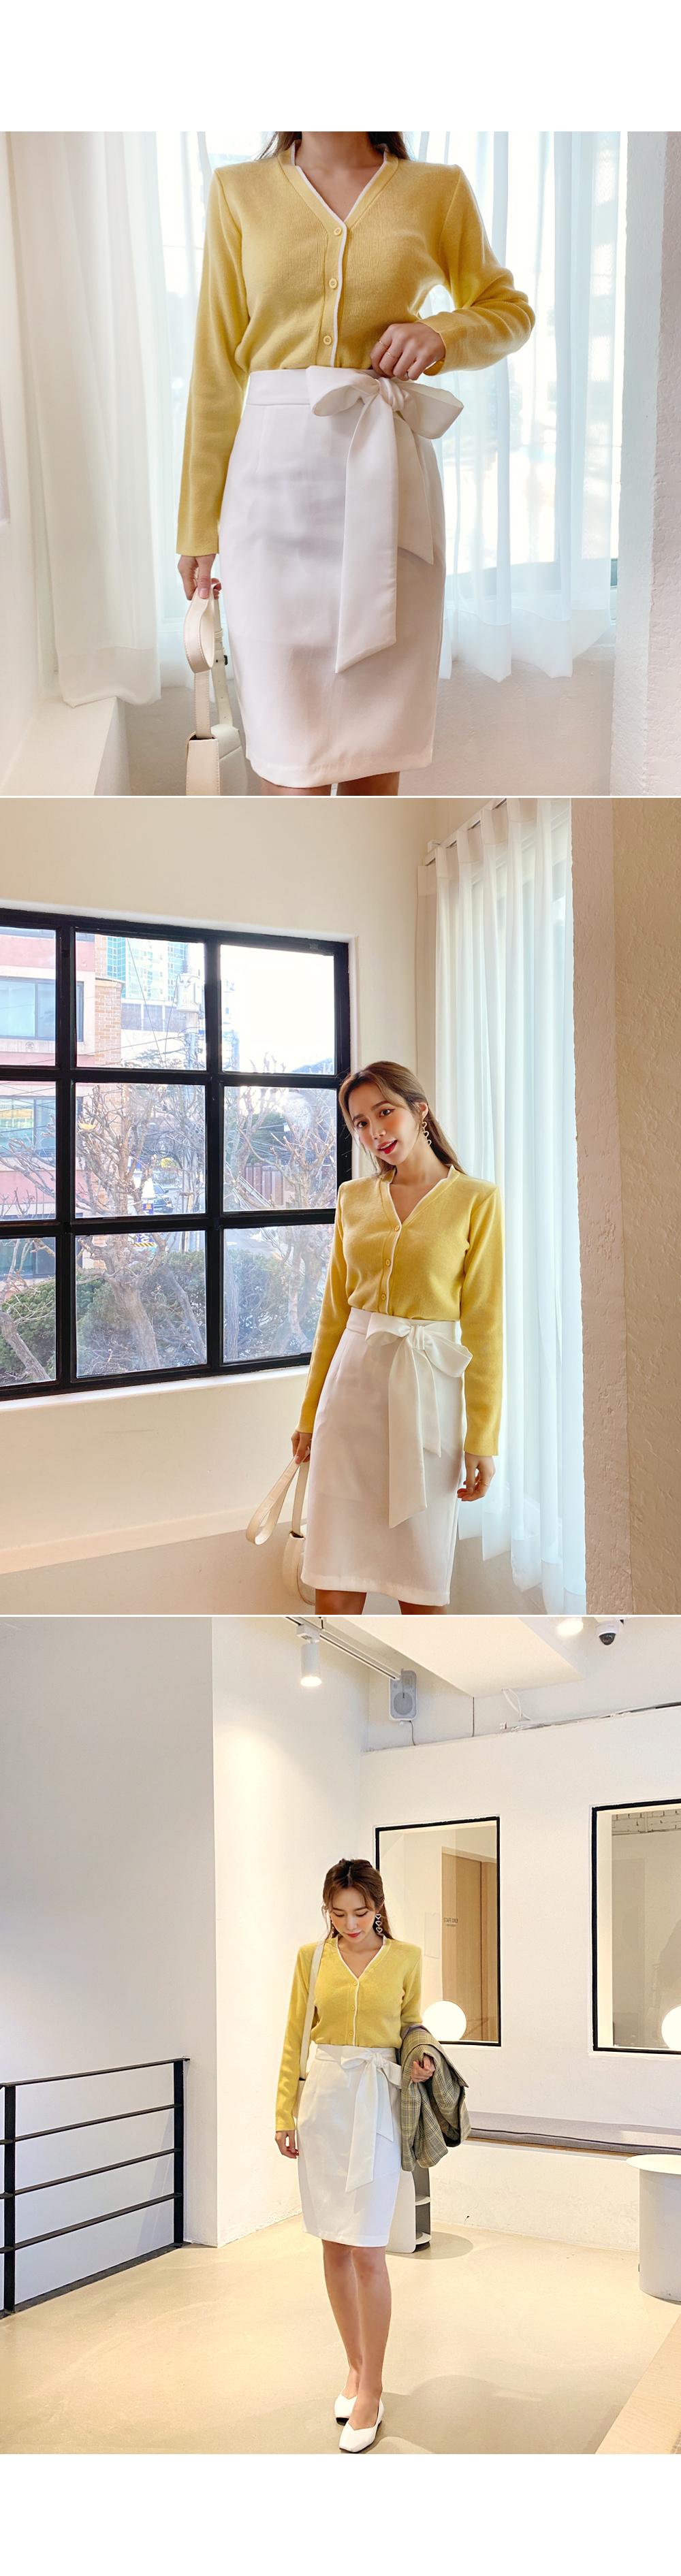 MatureAllure RibbonMidi Skirt